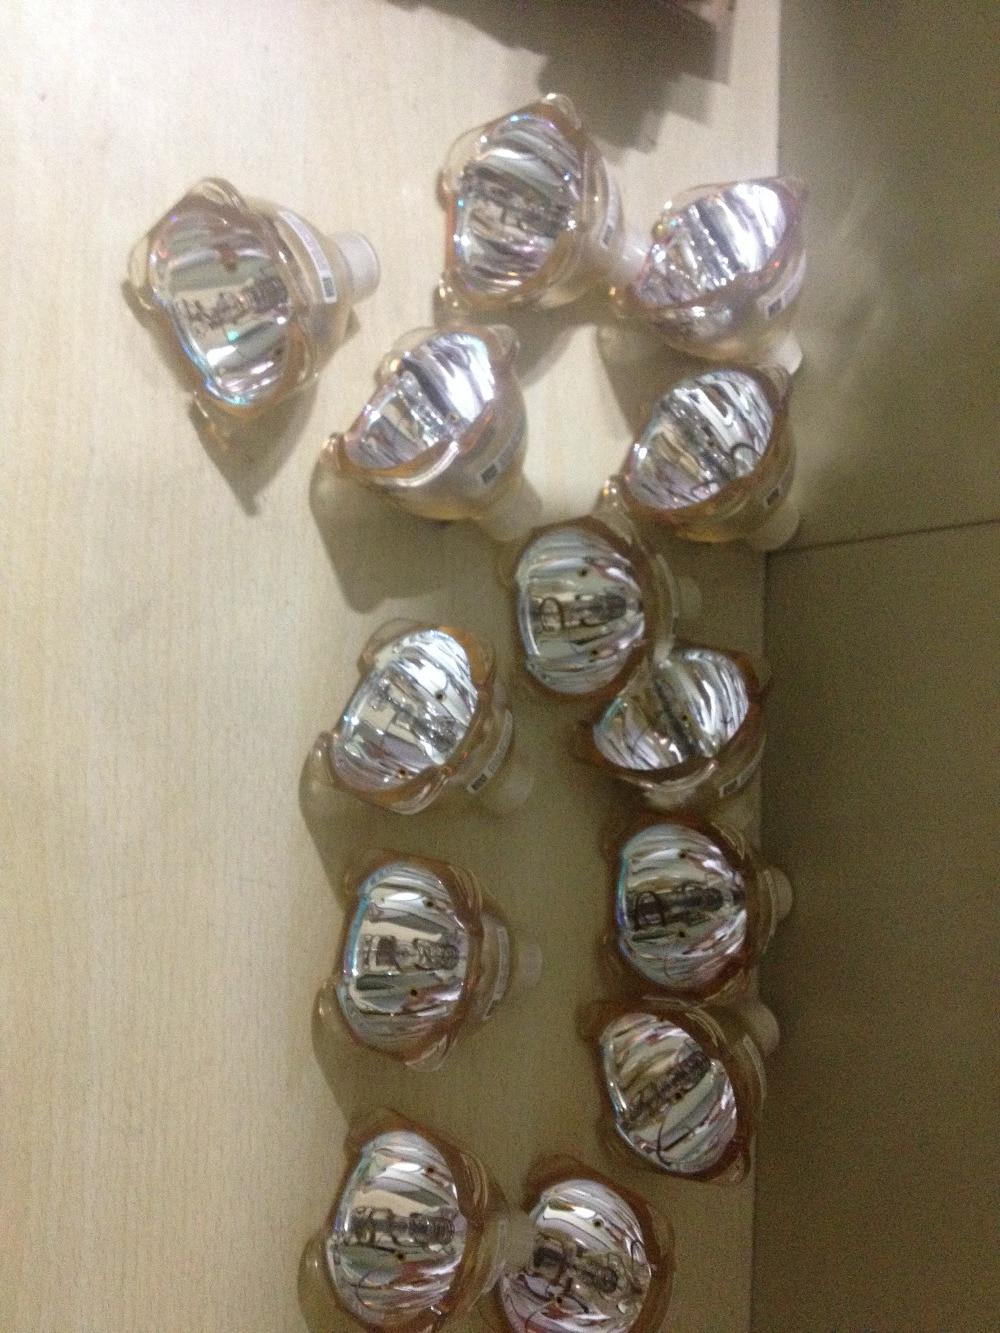 UHP 300/250W 1.3 E21.7  E21.8  Original Bare Projector lamp For BenQ MX760 / MX761 / MX762 / MX762ST / MX812ST кофемашина delonghi ecam 45 760 w белый